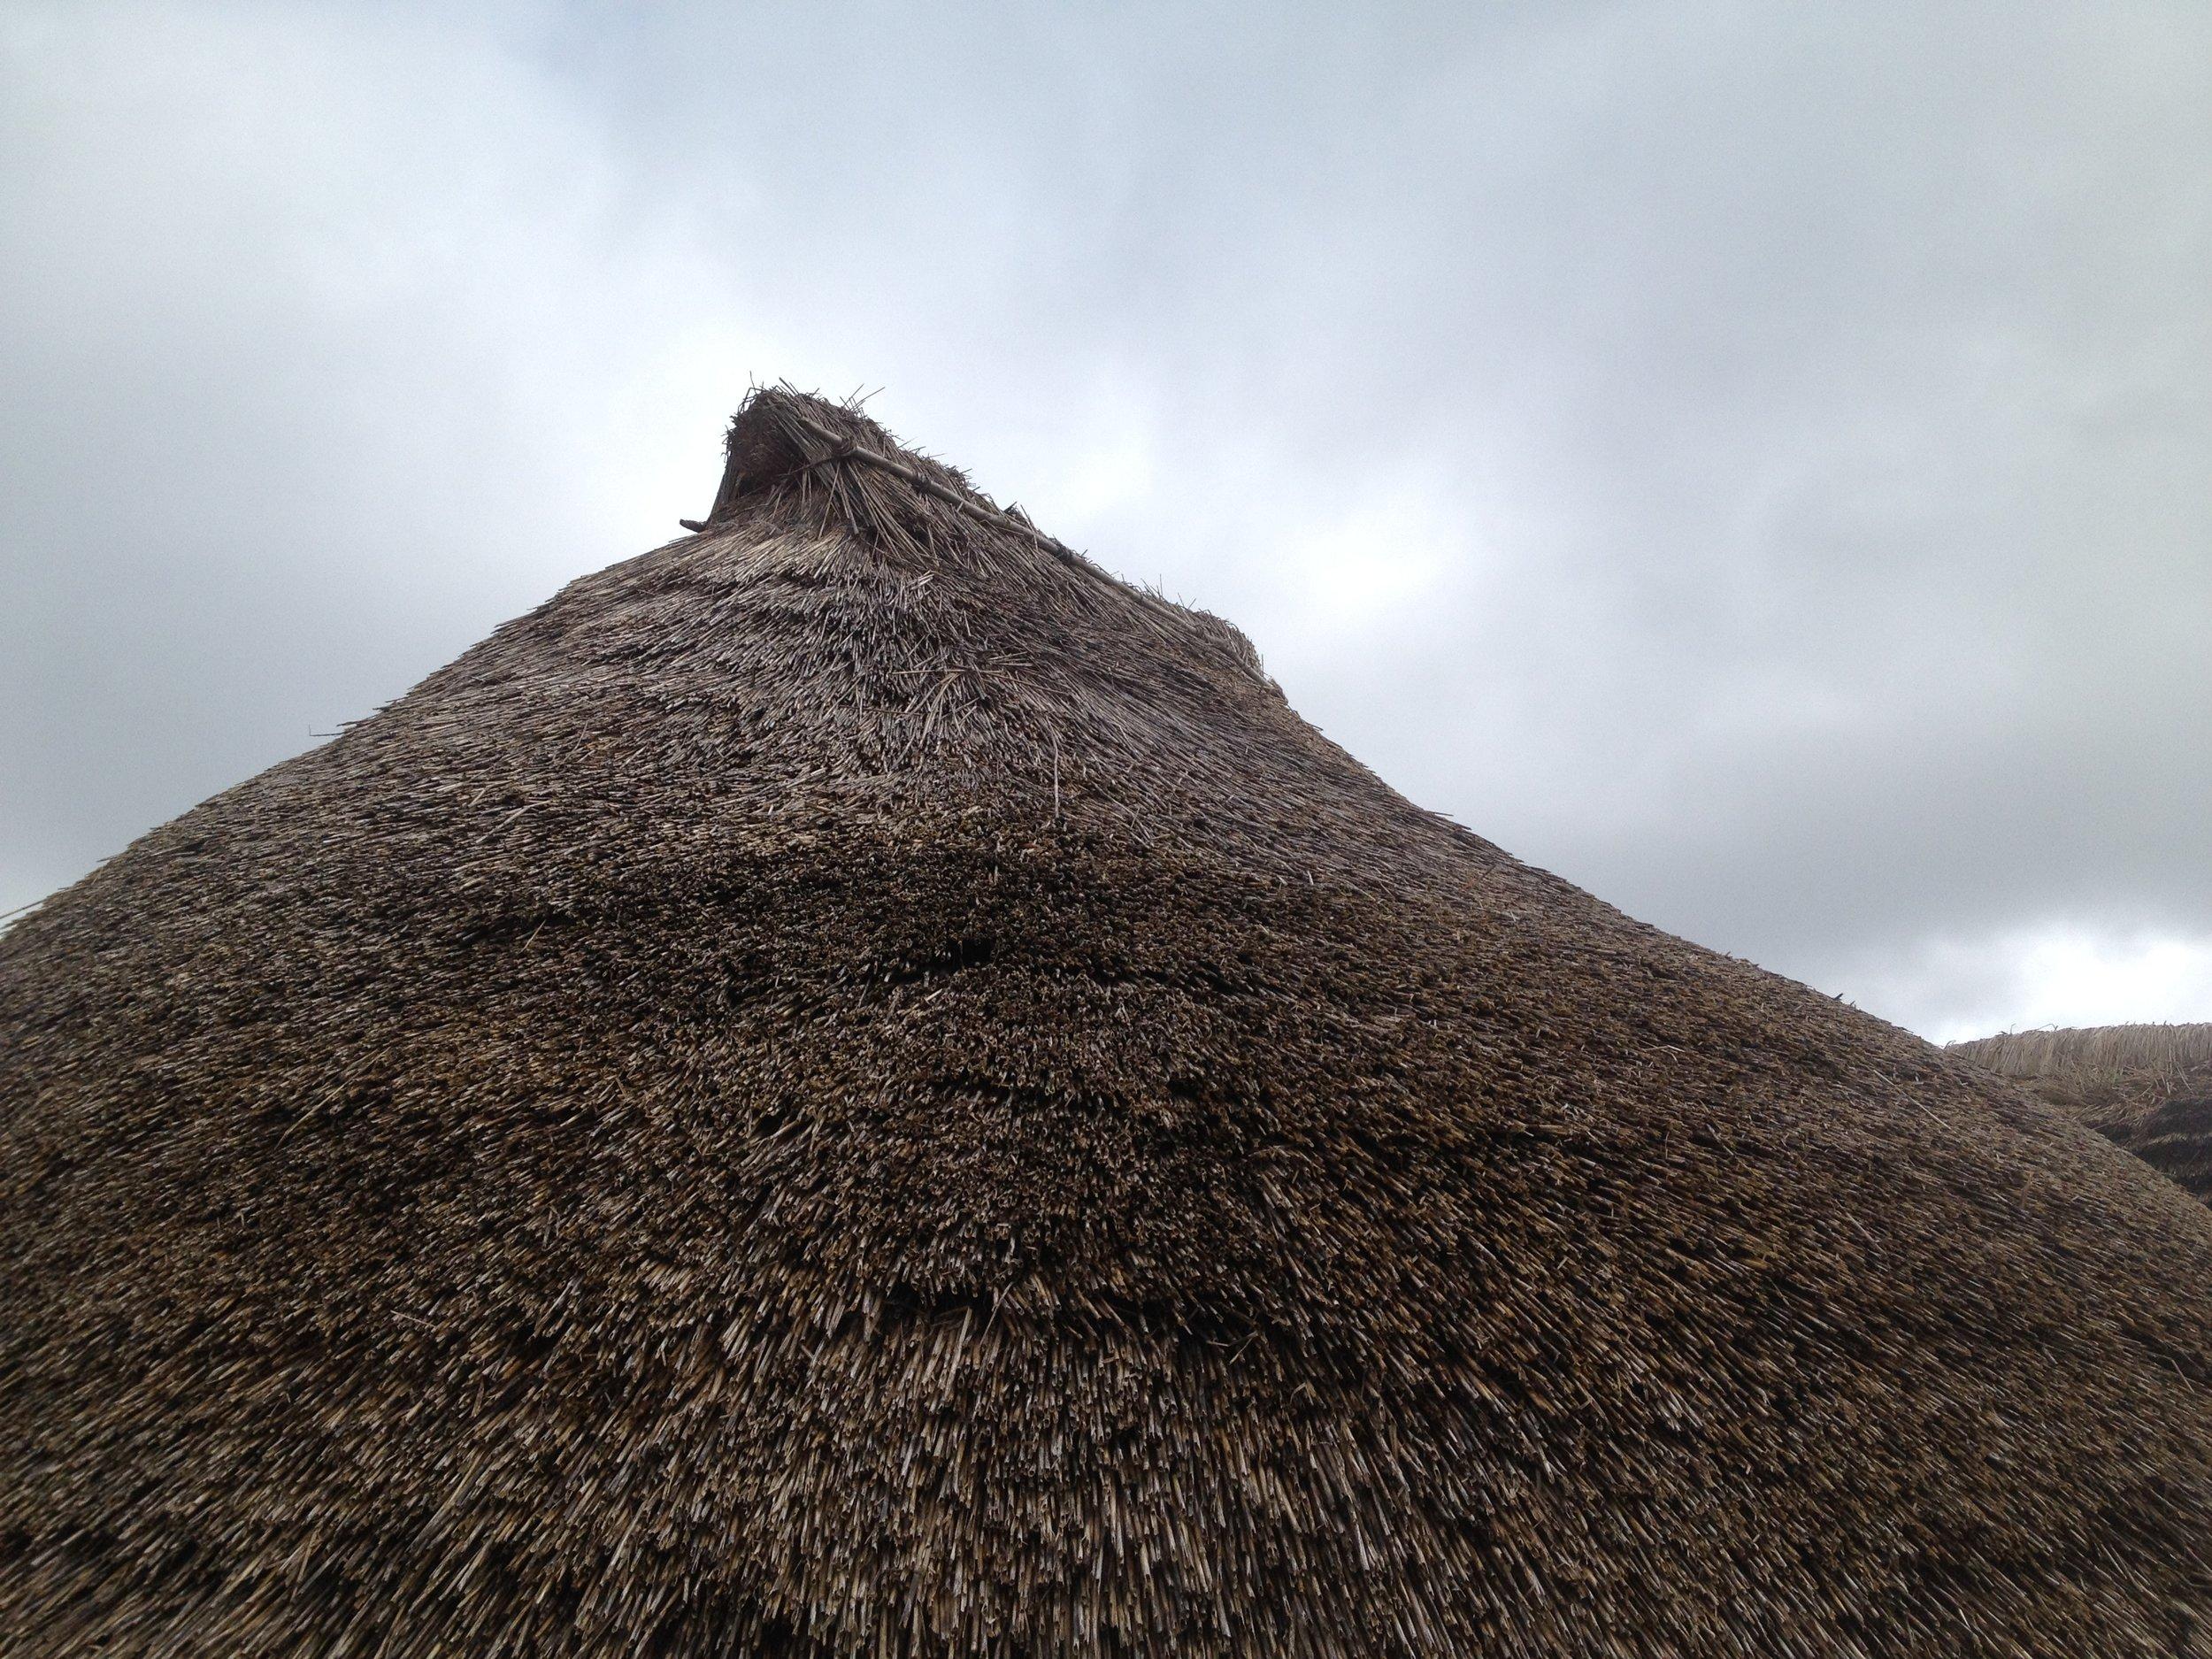 Stonehenge Hut